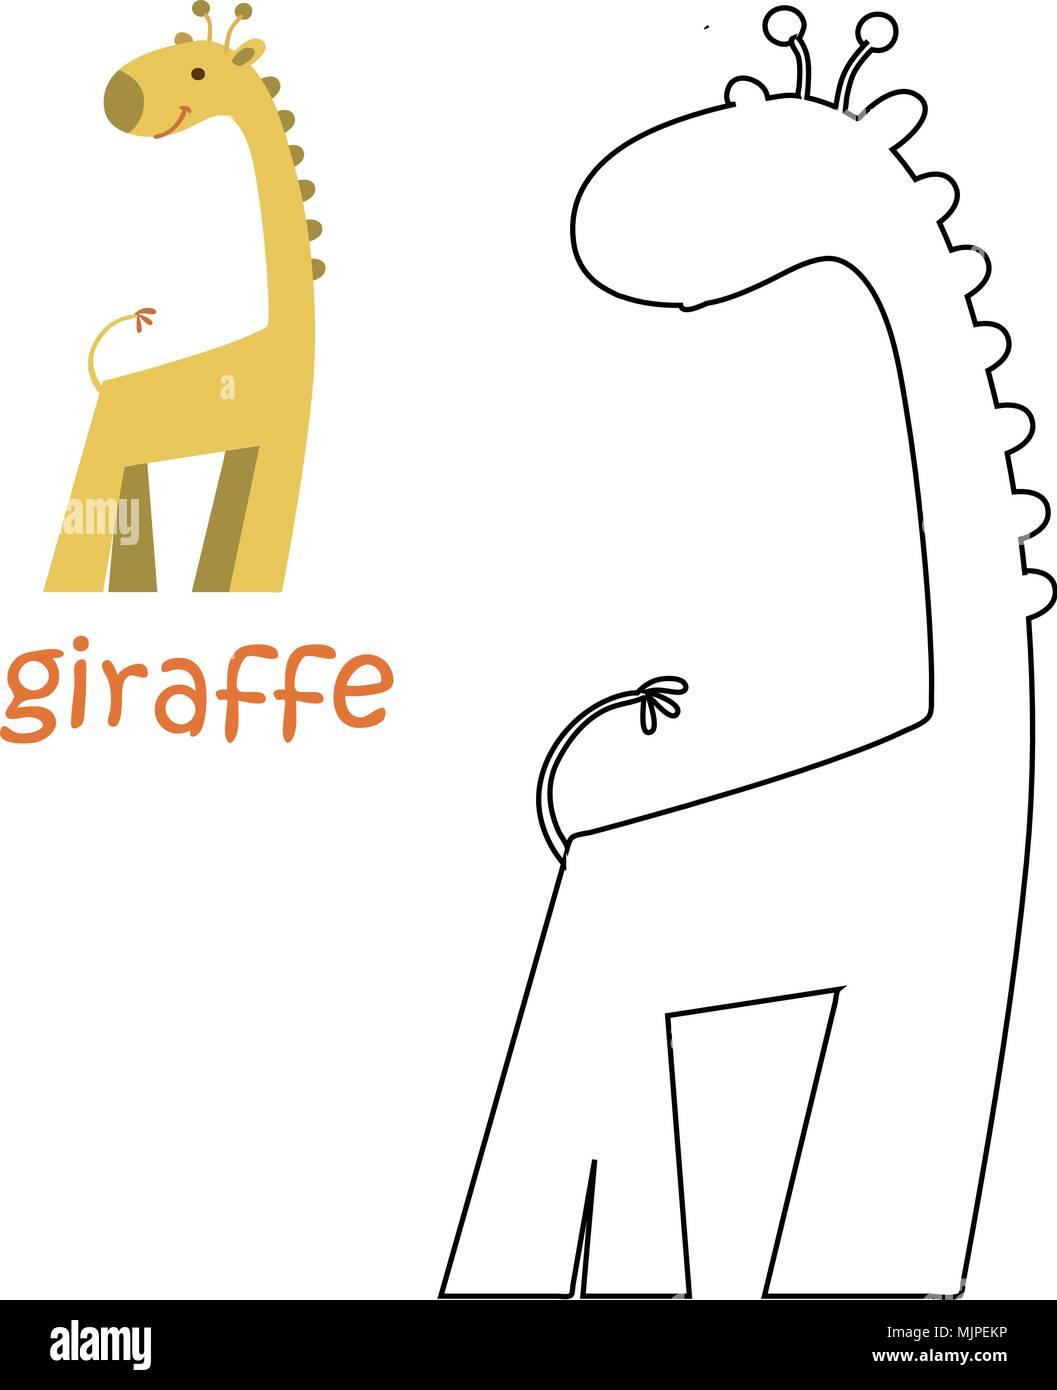 Kids coloring page - giraffe Stock Vector Art & Illustration, Vector ...